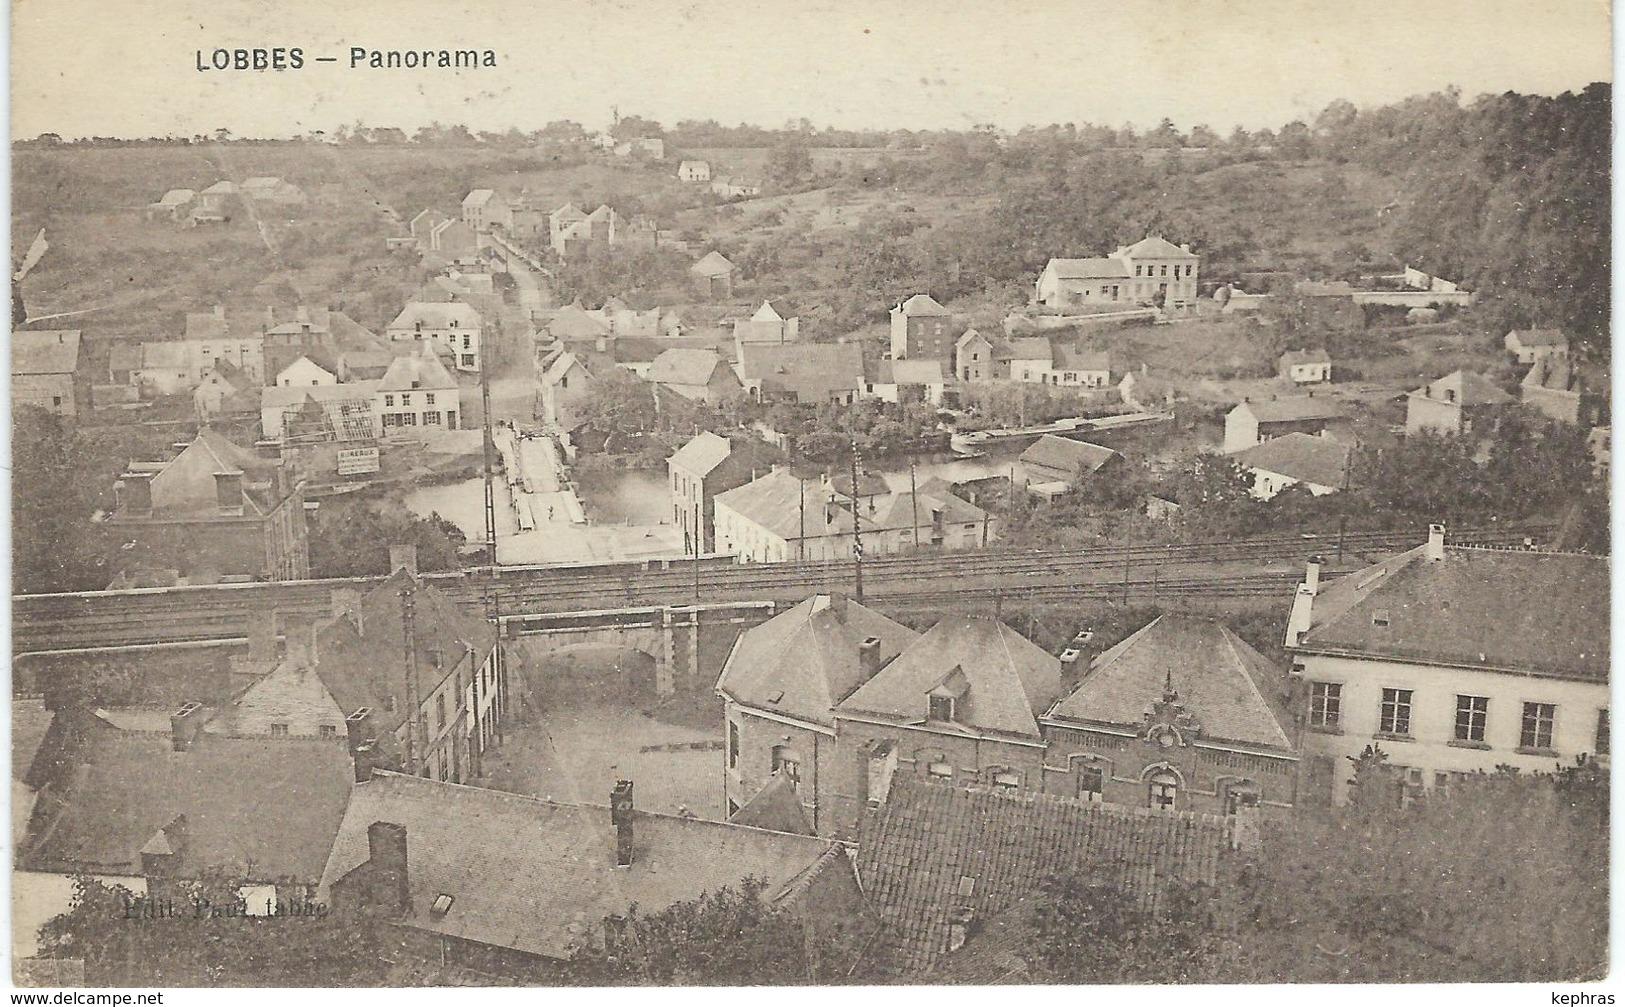 LOBBES : Panorama - CPA PEU COURANTE - Lobbes